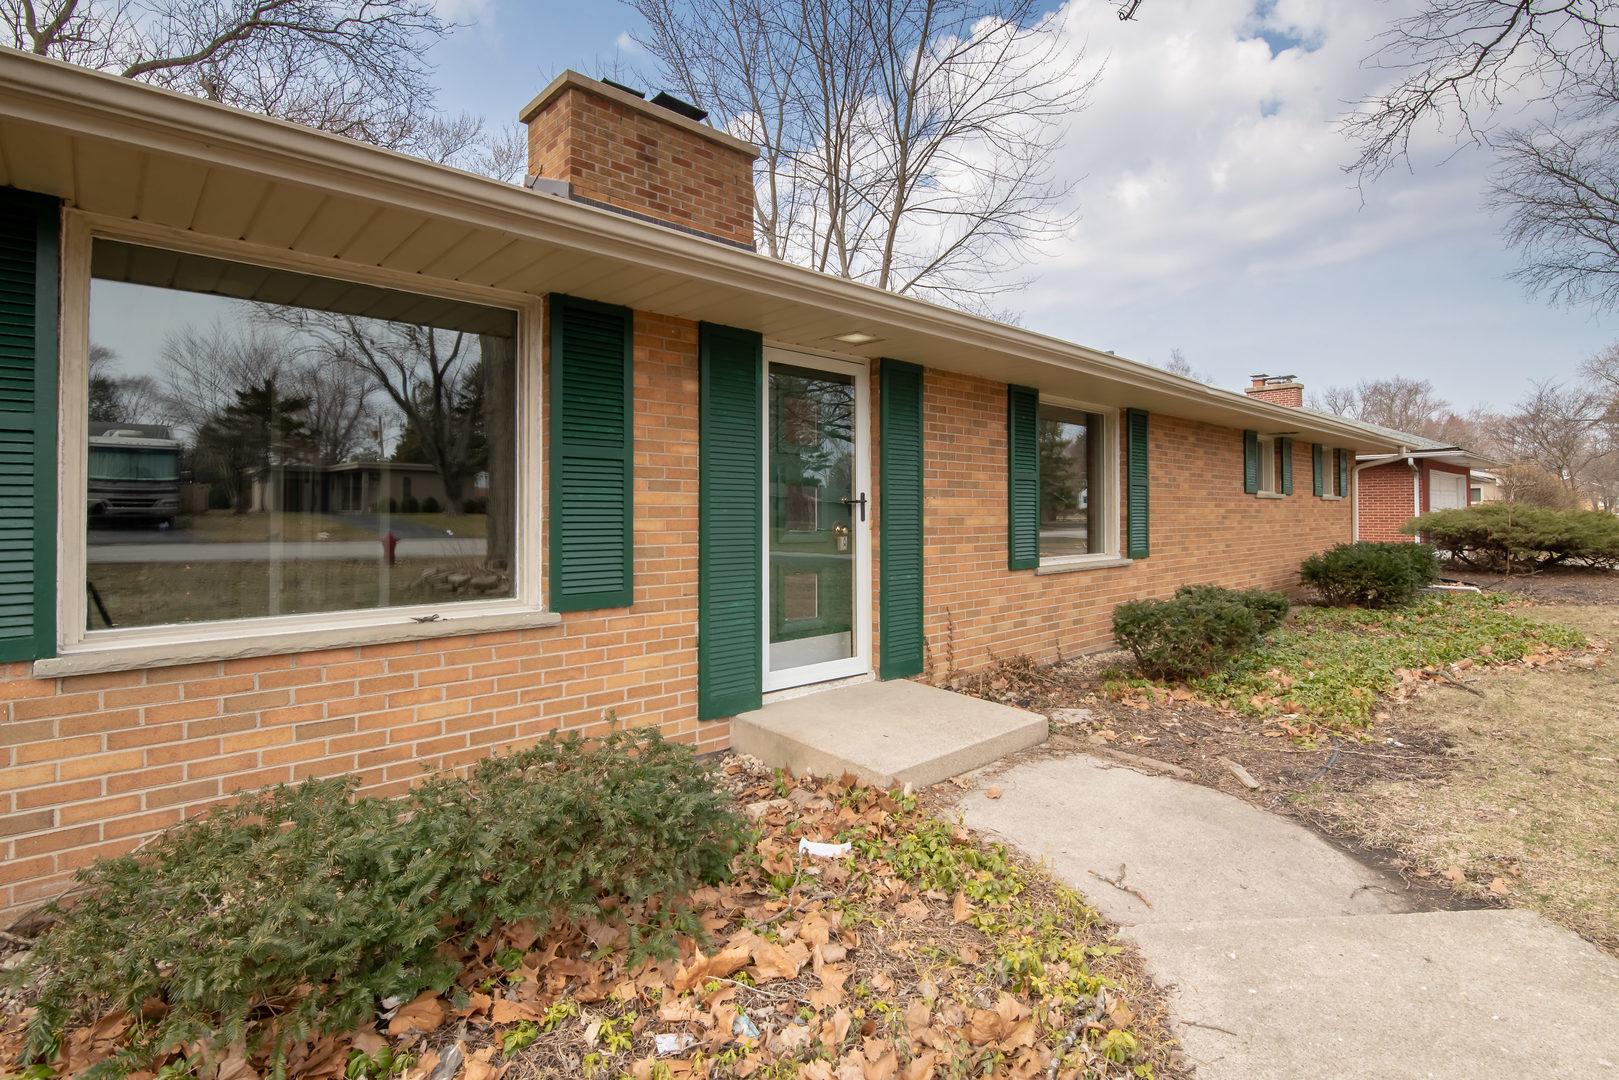 323 South Western, Aurora, Illinois, 60506